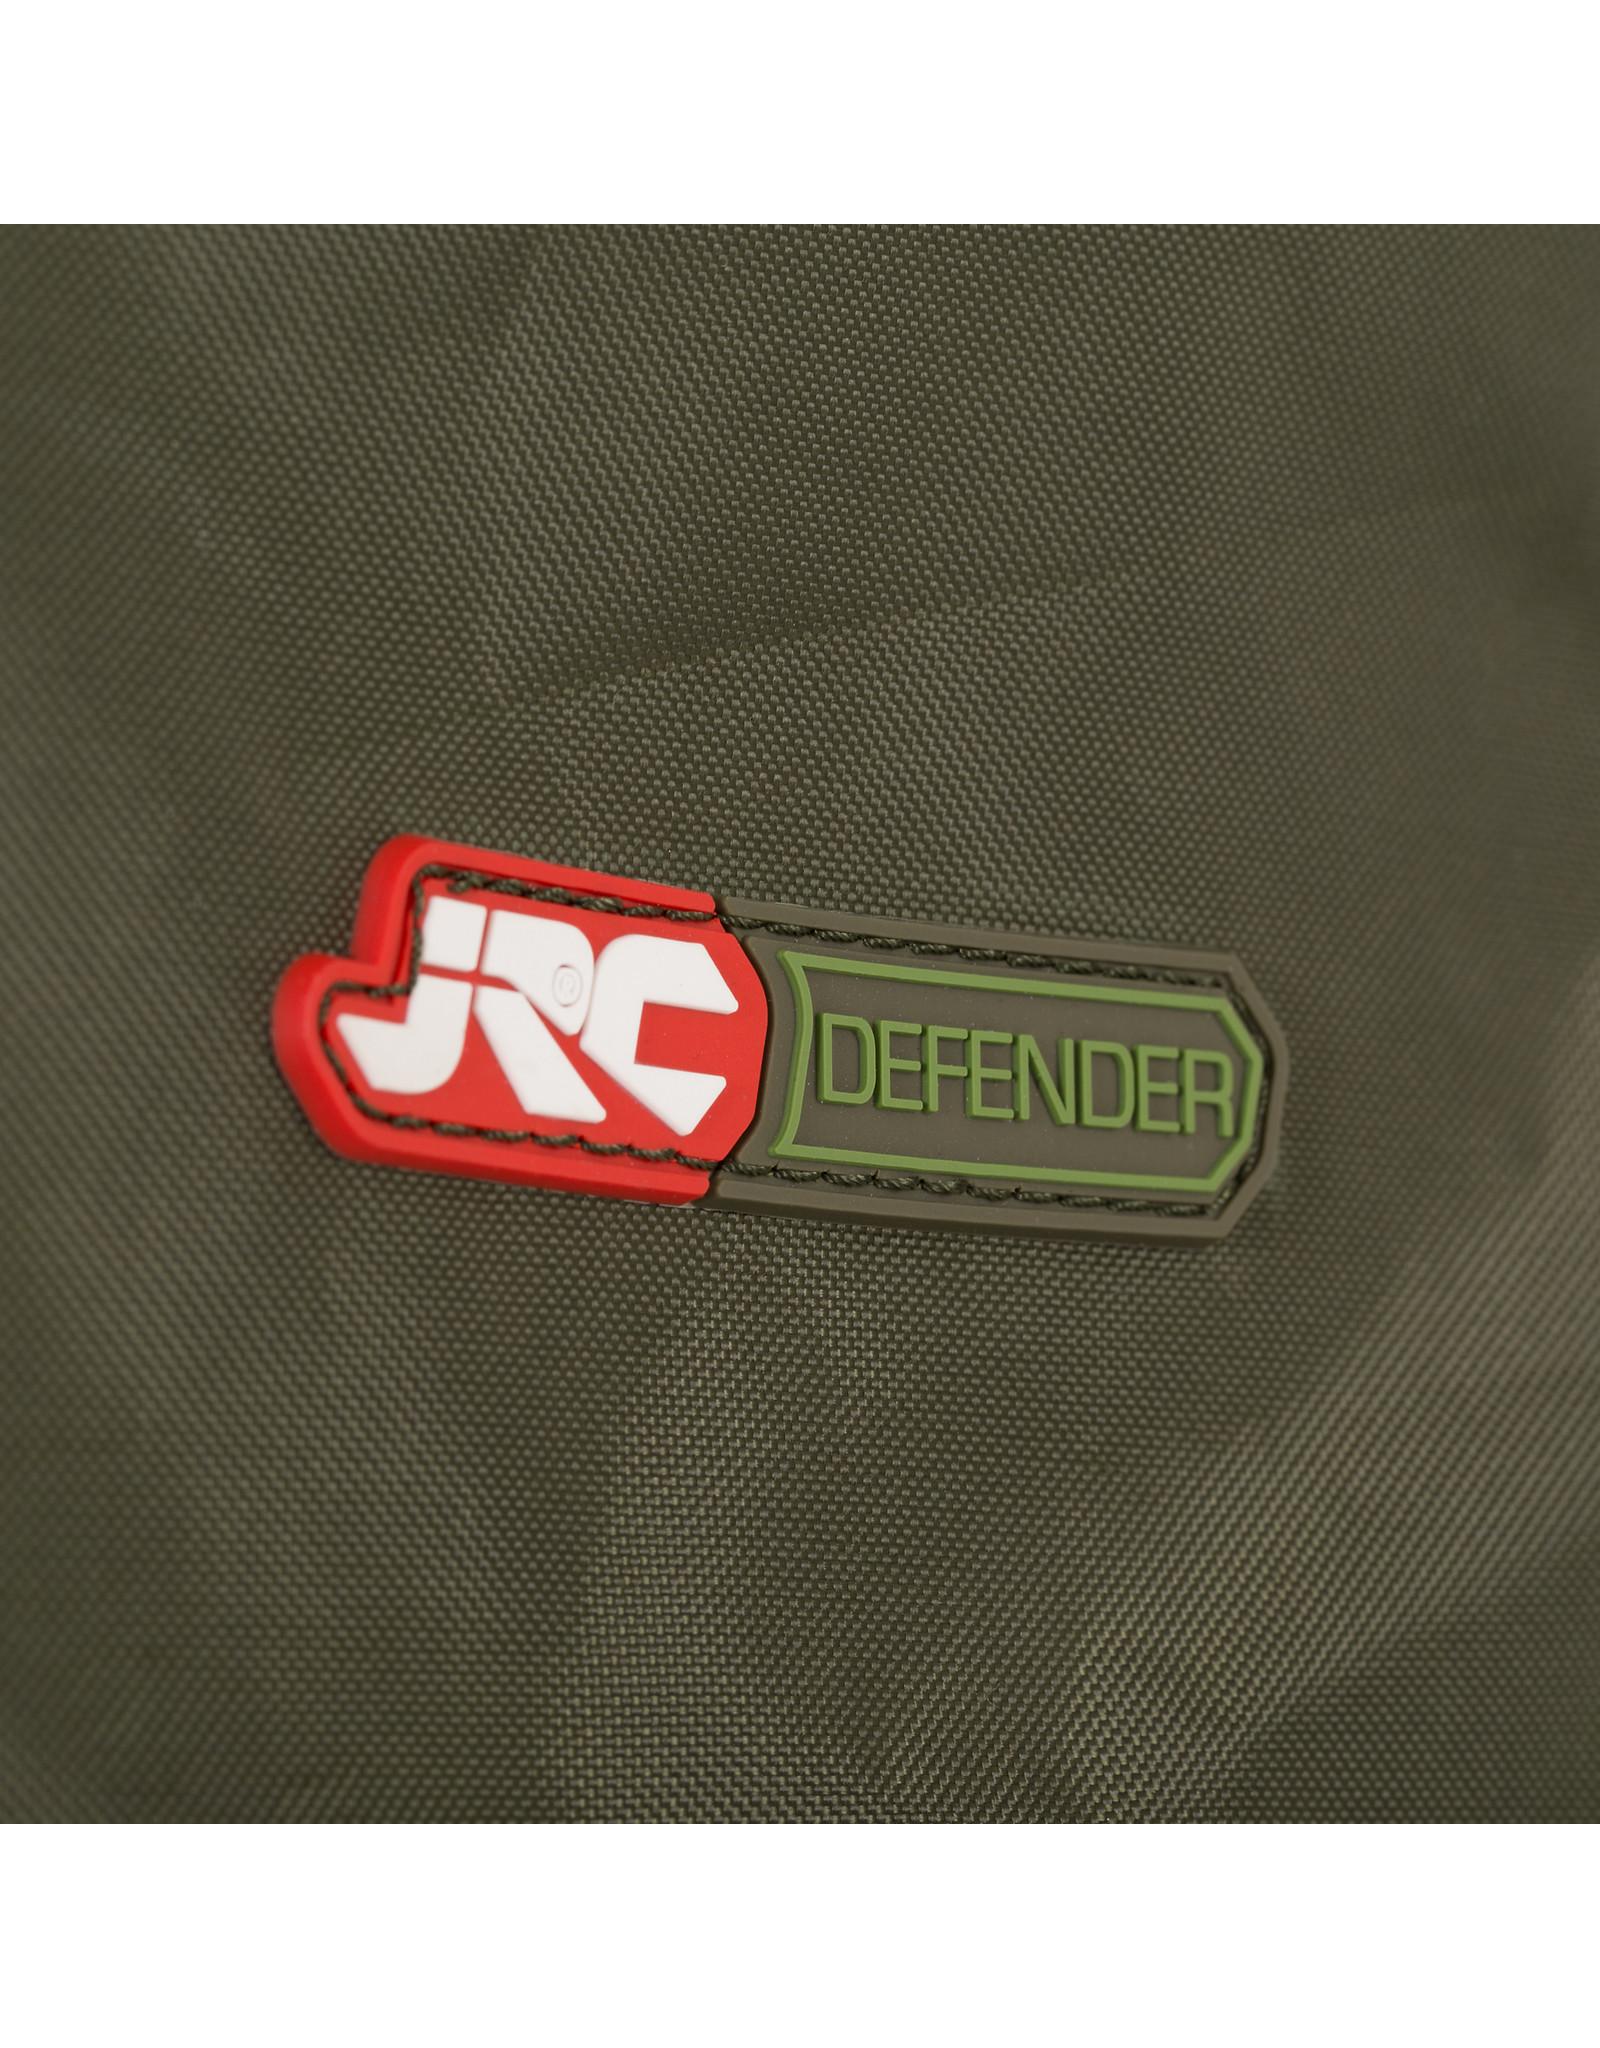 JRC JRC Defender Safety Weigh Sling